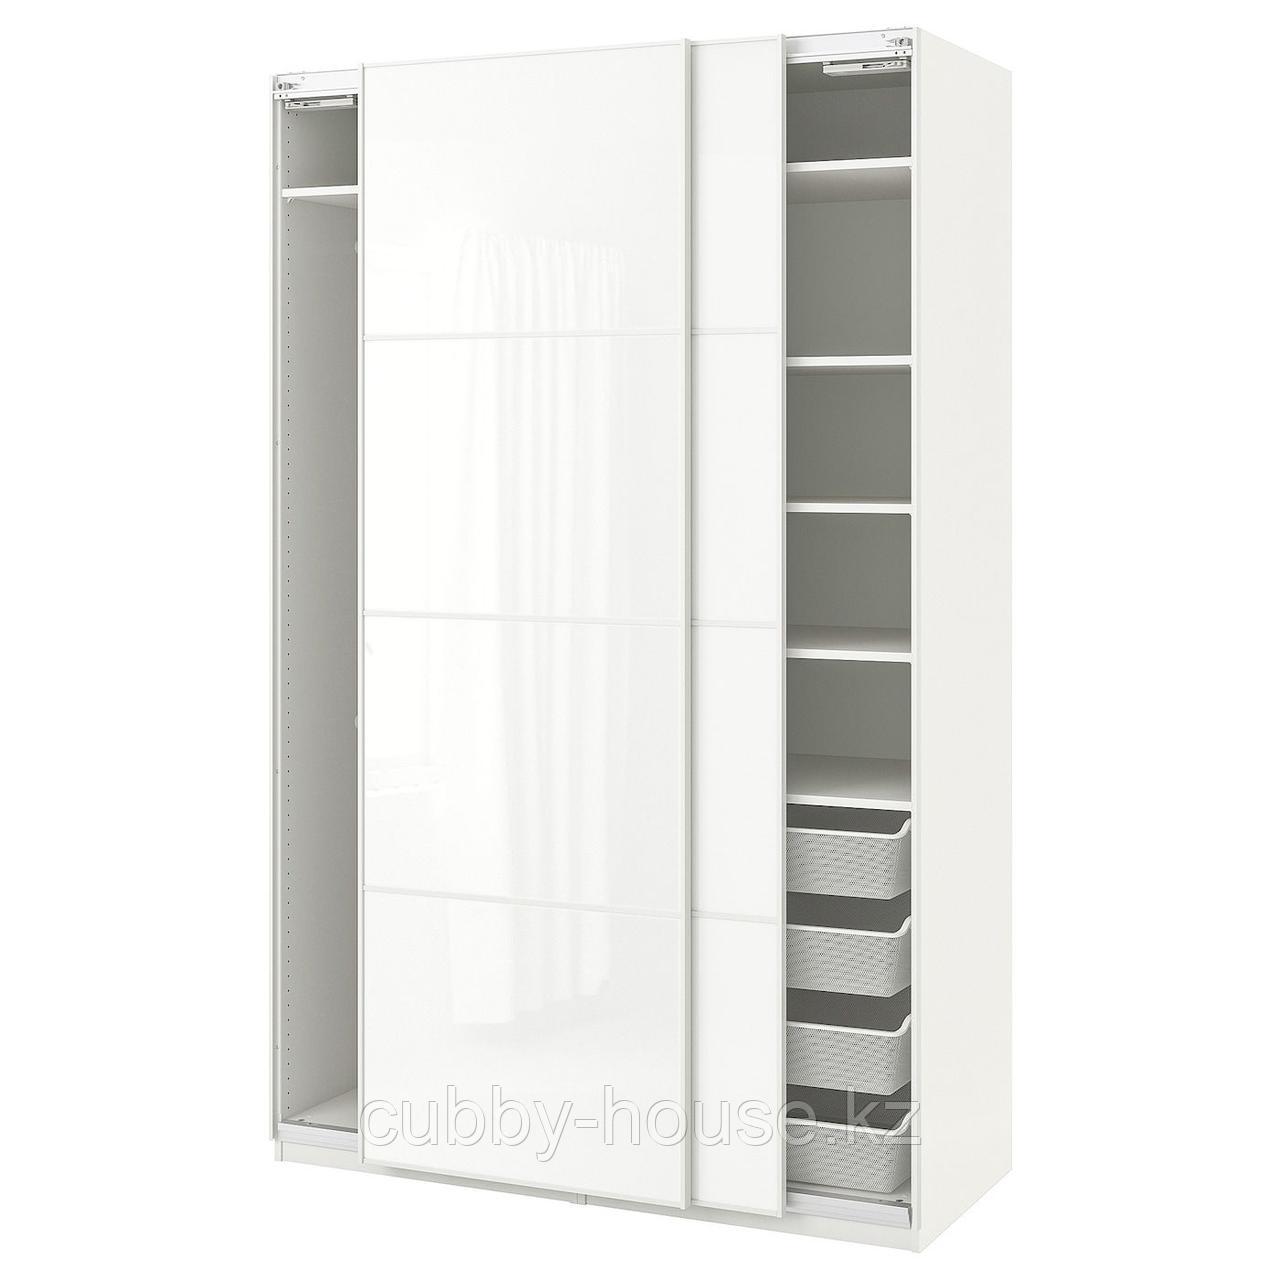 ПАКС Гардероб, белый, Фэрвик белое стекло, 150x66x236 см